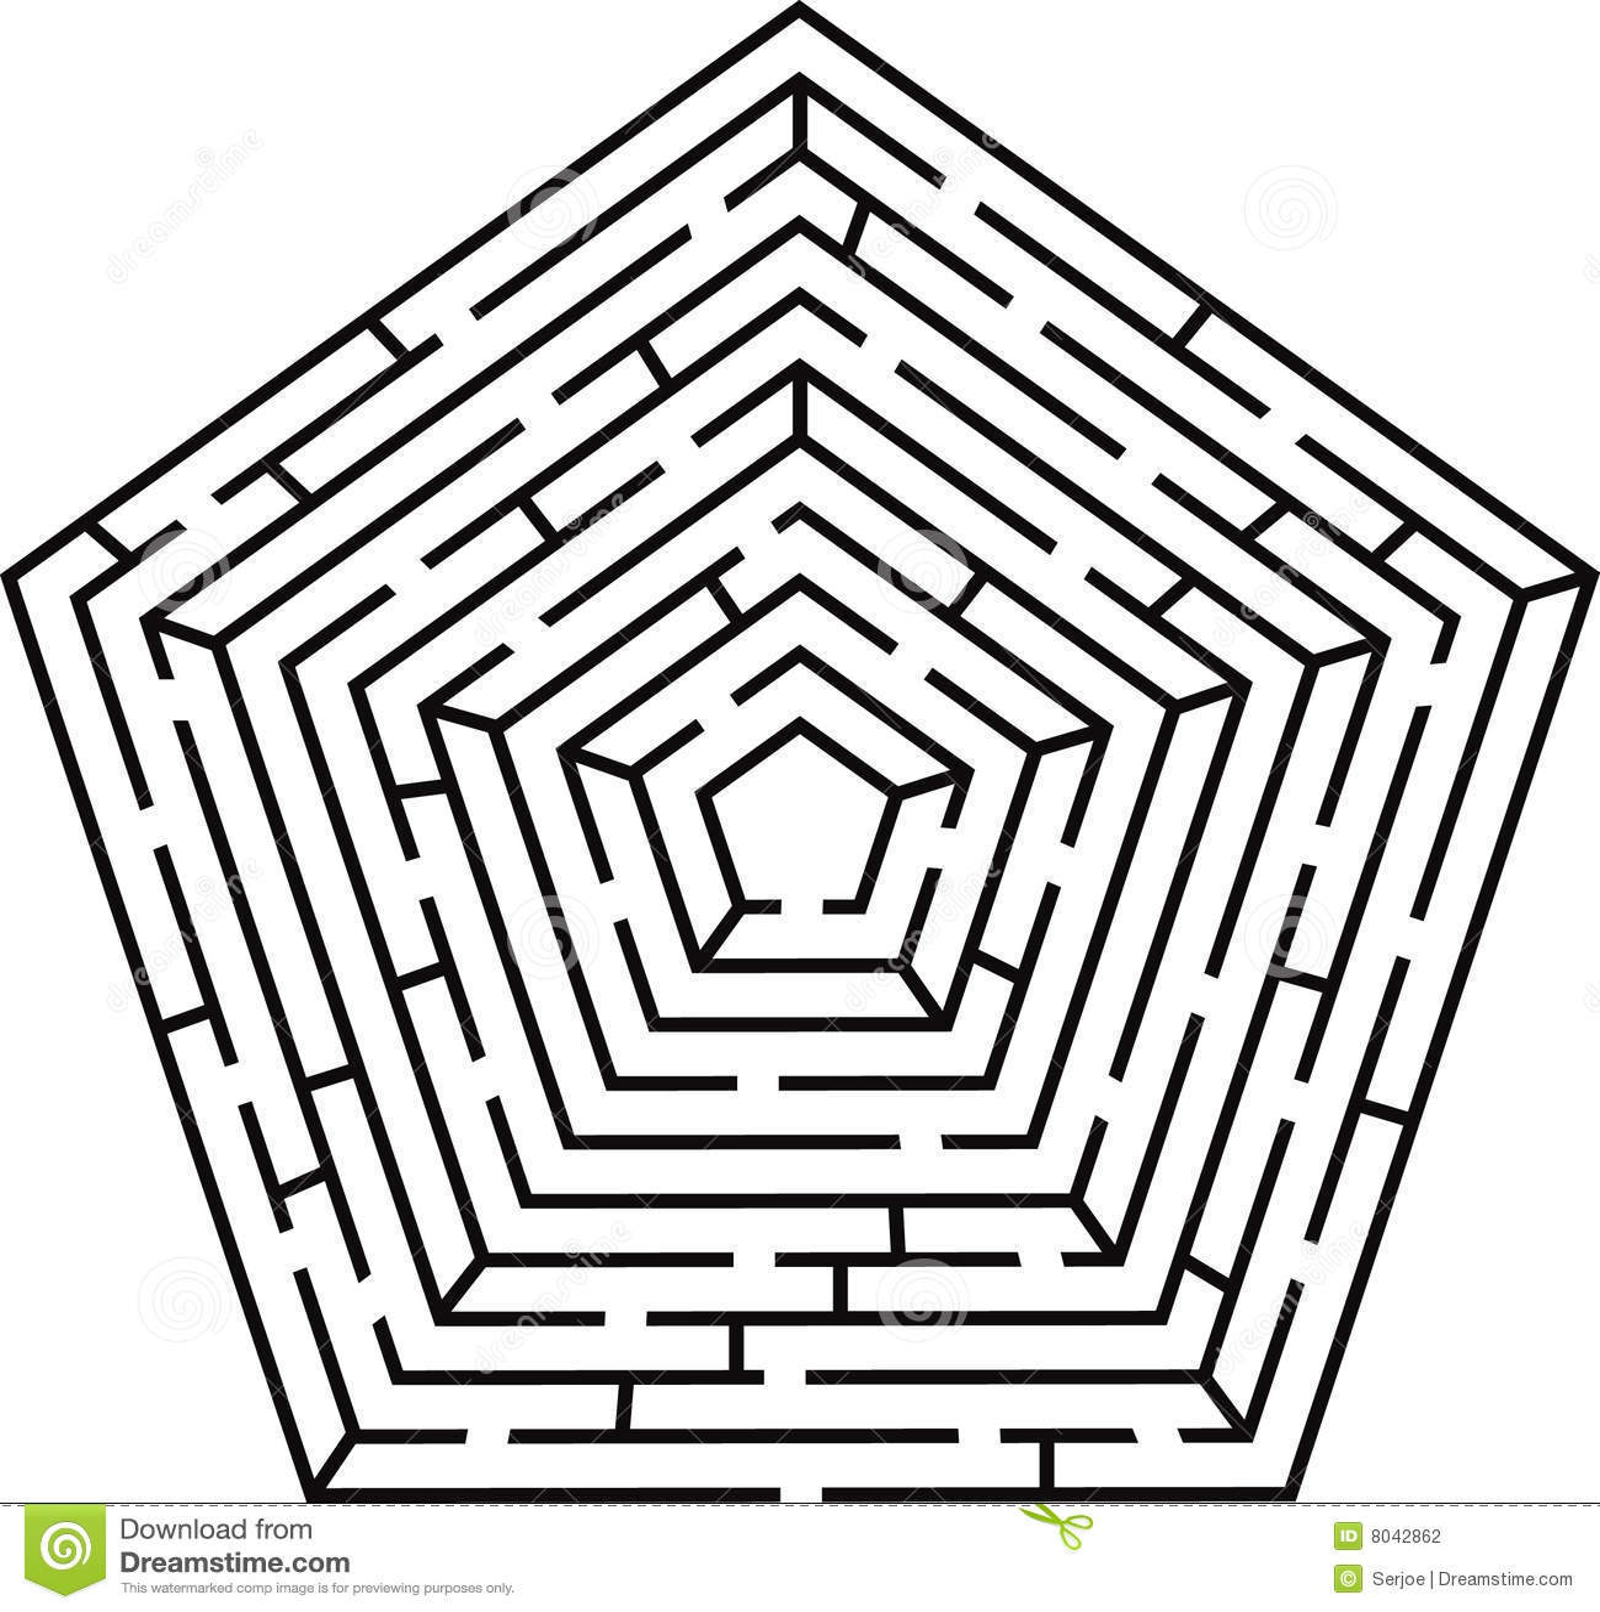 Pentagon Labyrinth Stock Vector Illustration Of Design